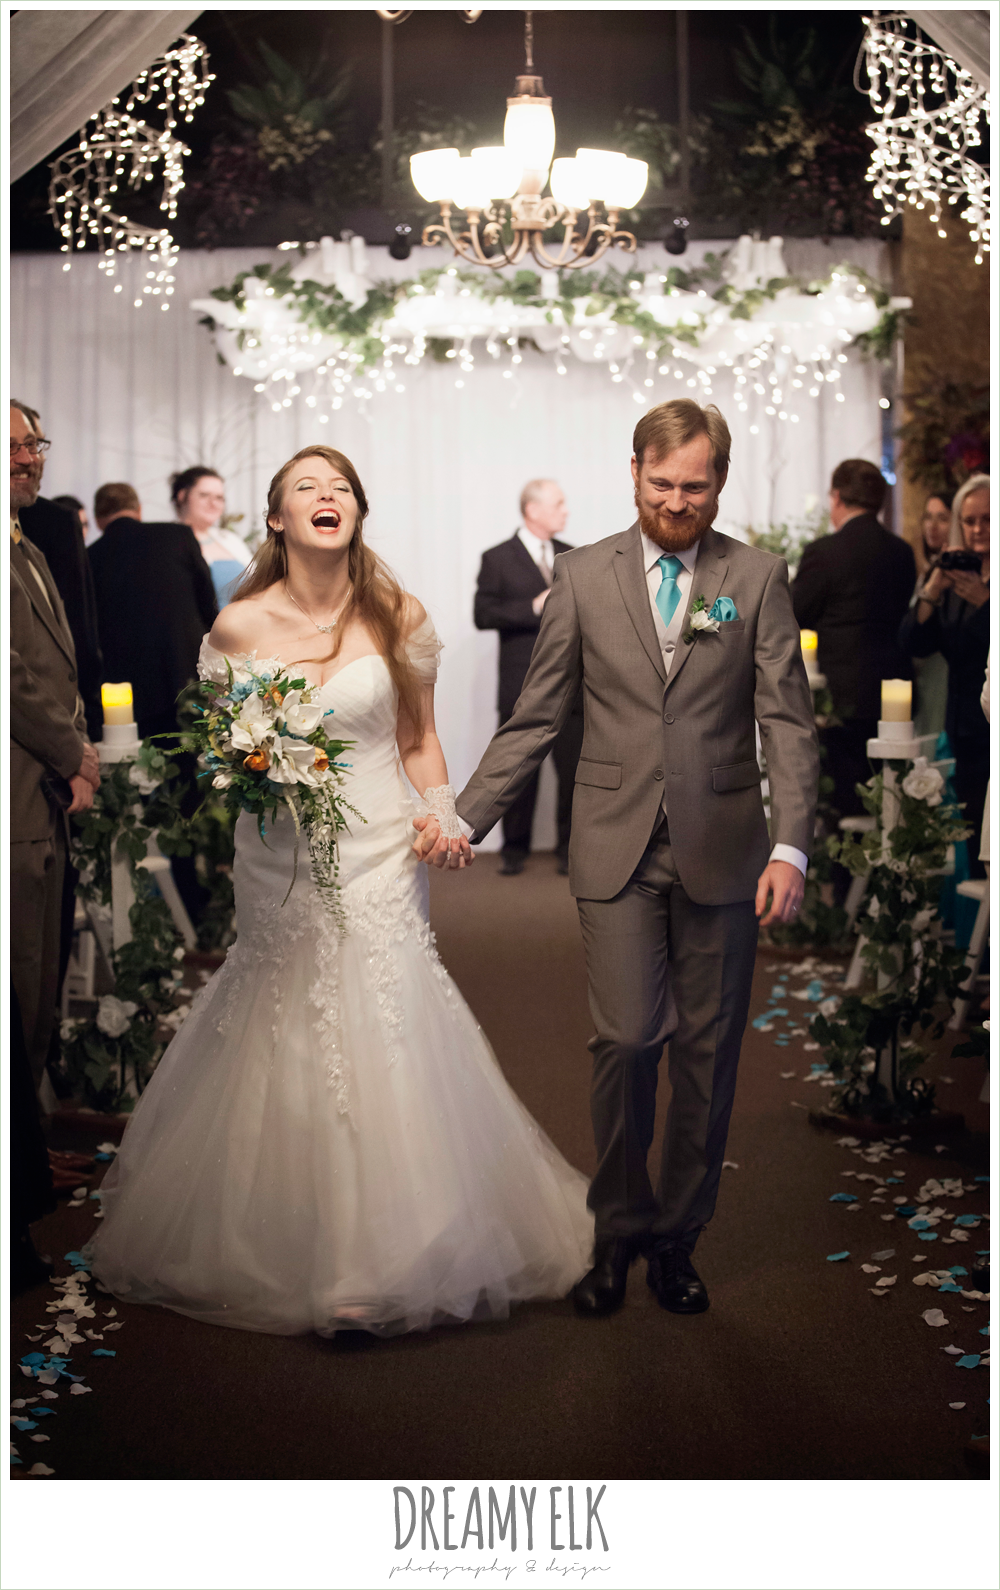 bride and groom walking down the aisle, indoor wedding ceremony, off the shoulder mermaid wedding dress, groom in gray suit, le jardin winter wedding {dreamy elk photography and design}